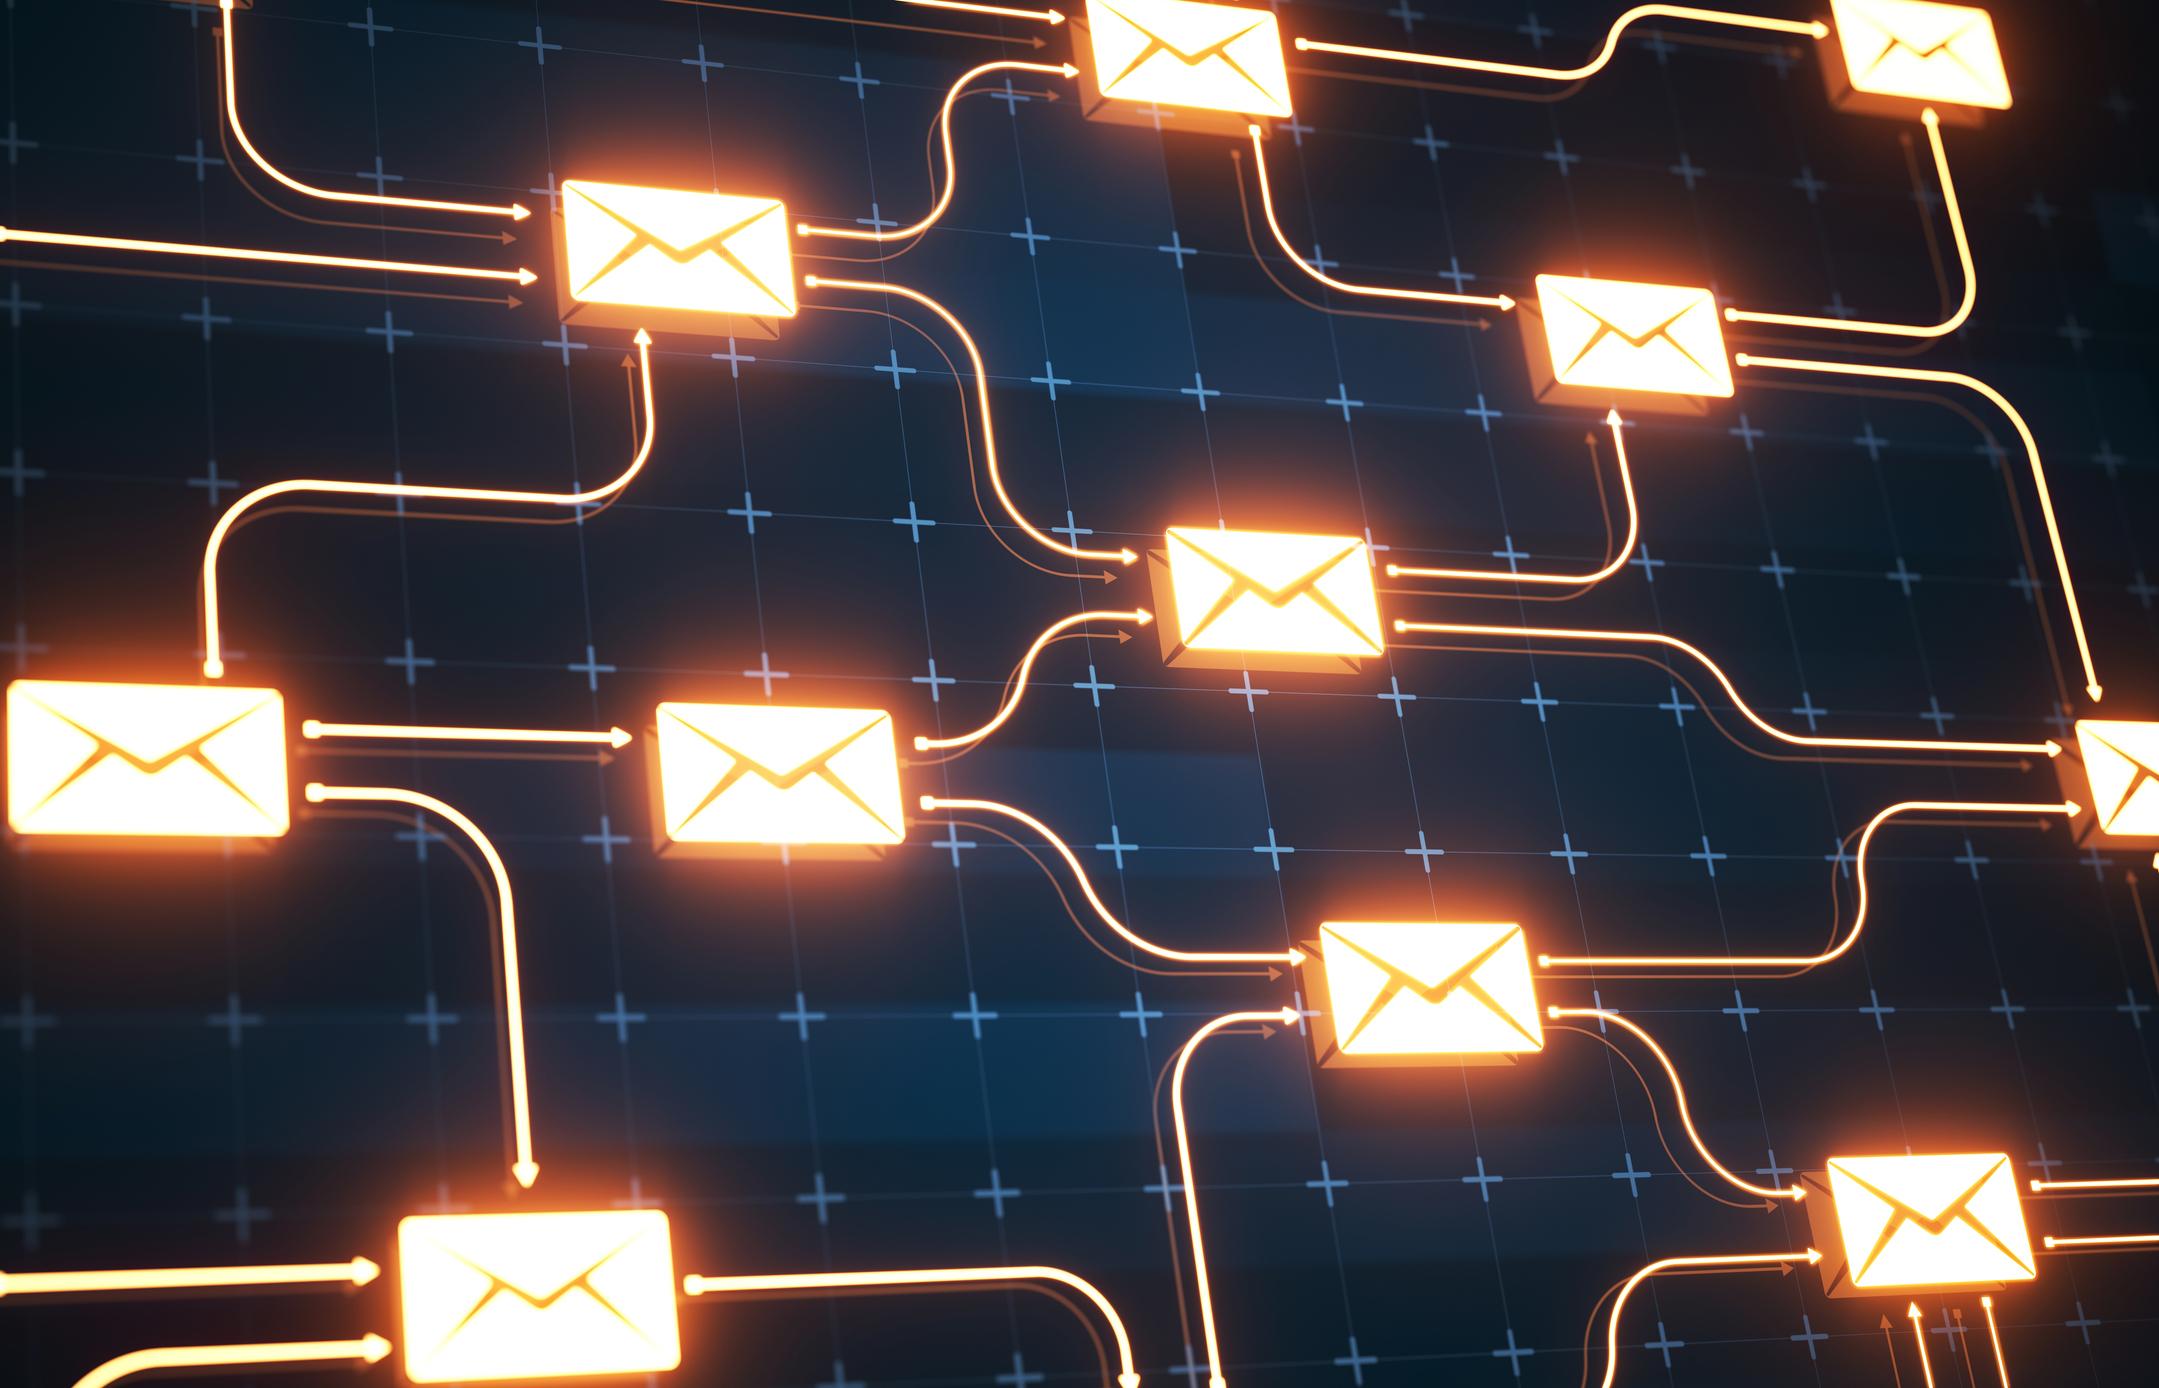 Email marketing online message network communication on digital background.